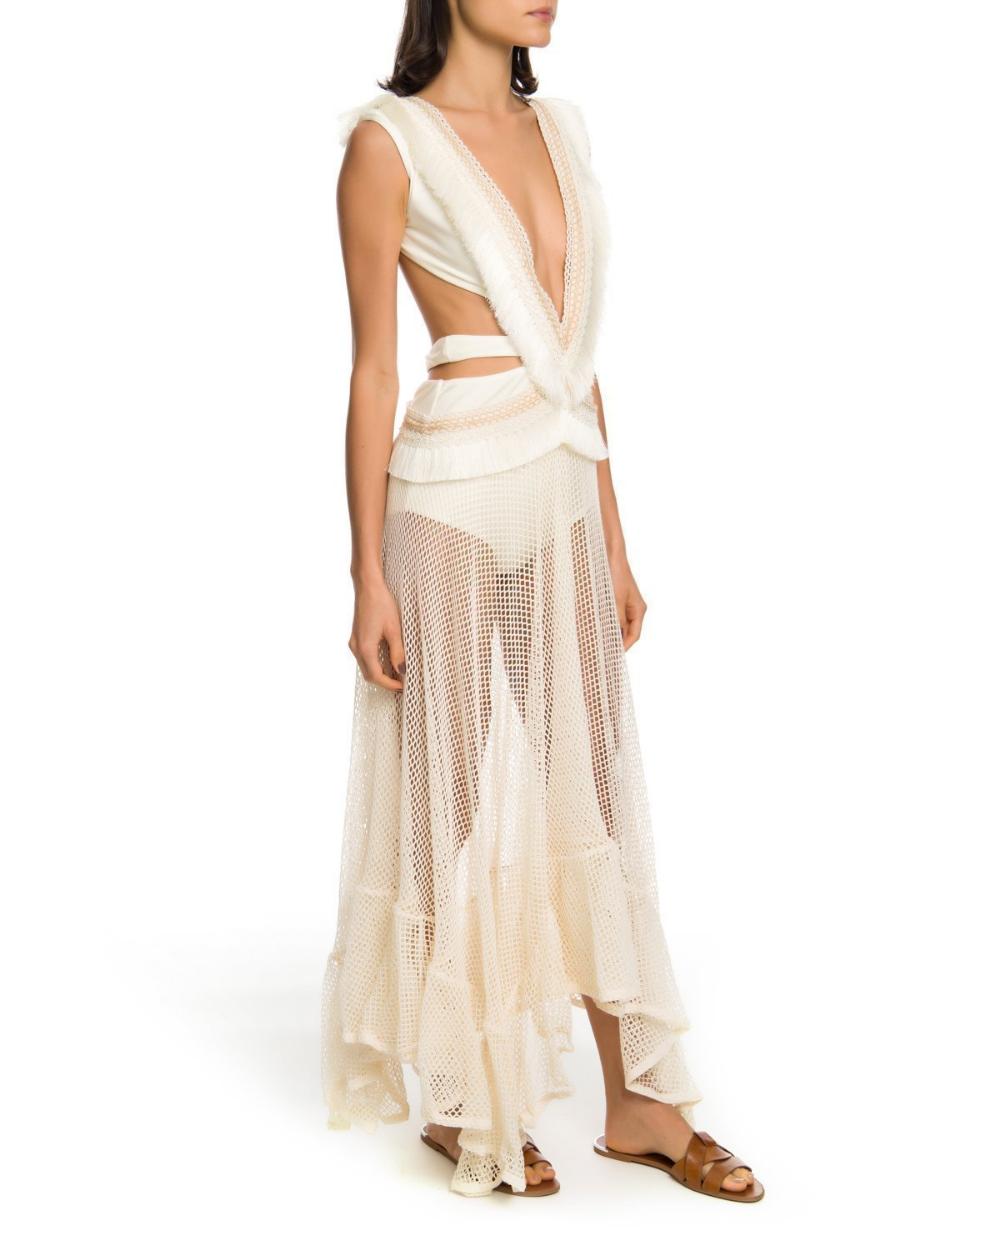 Patbo Fringe And Mesh Cutout Maxi Dress Pre Order Patbo Cutout Maxi Dress Maxi Dress Online Maxi Dress [ 1250 x 1000 Pixel ]